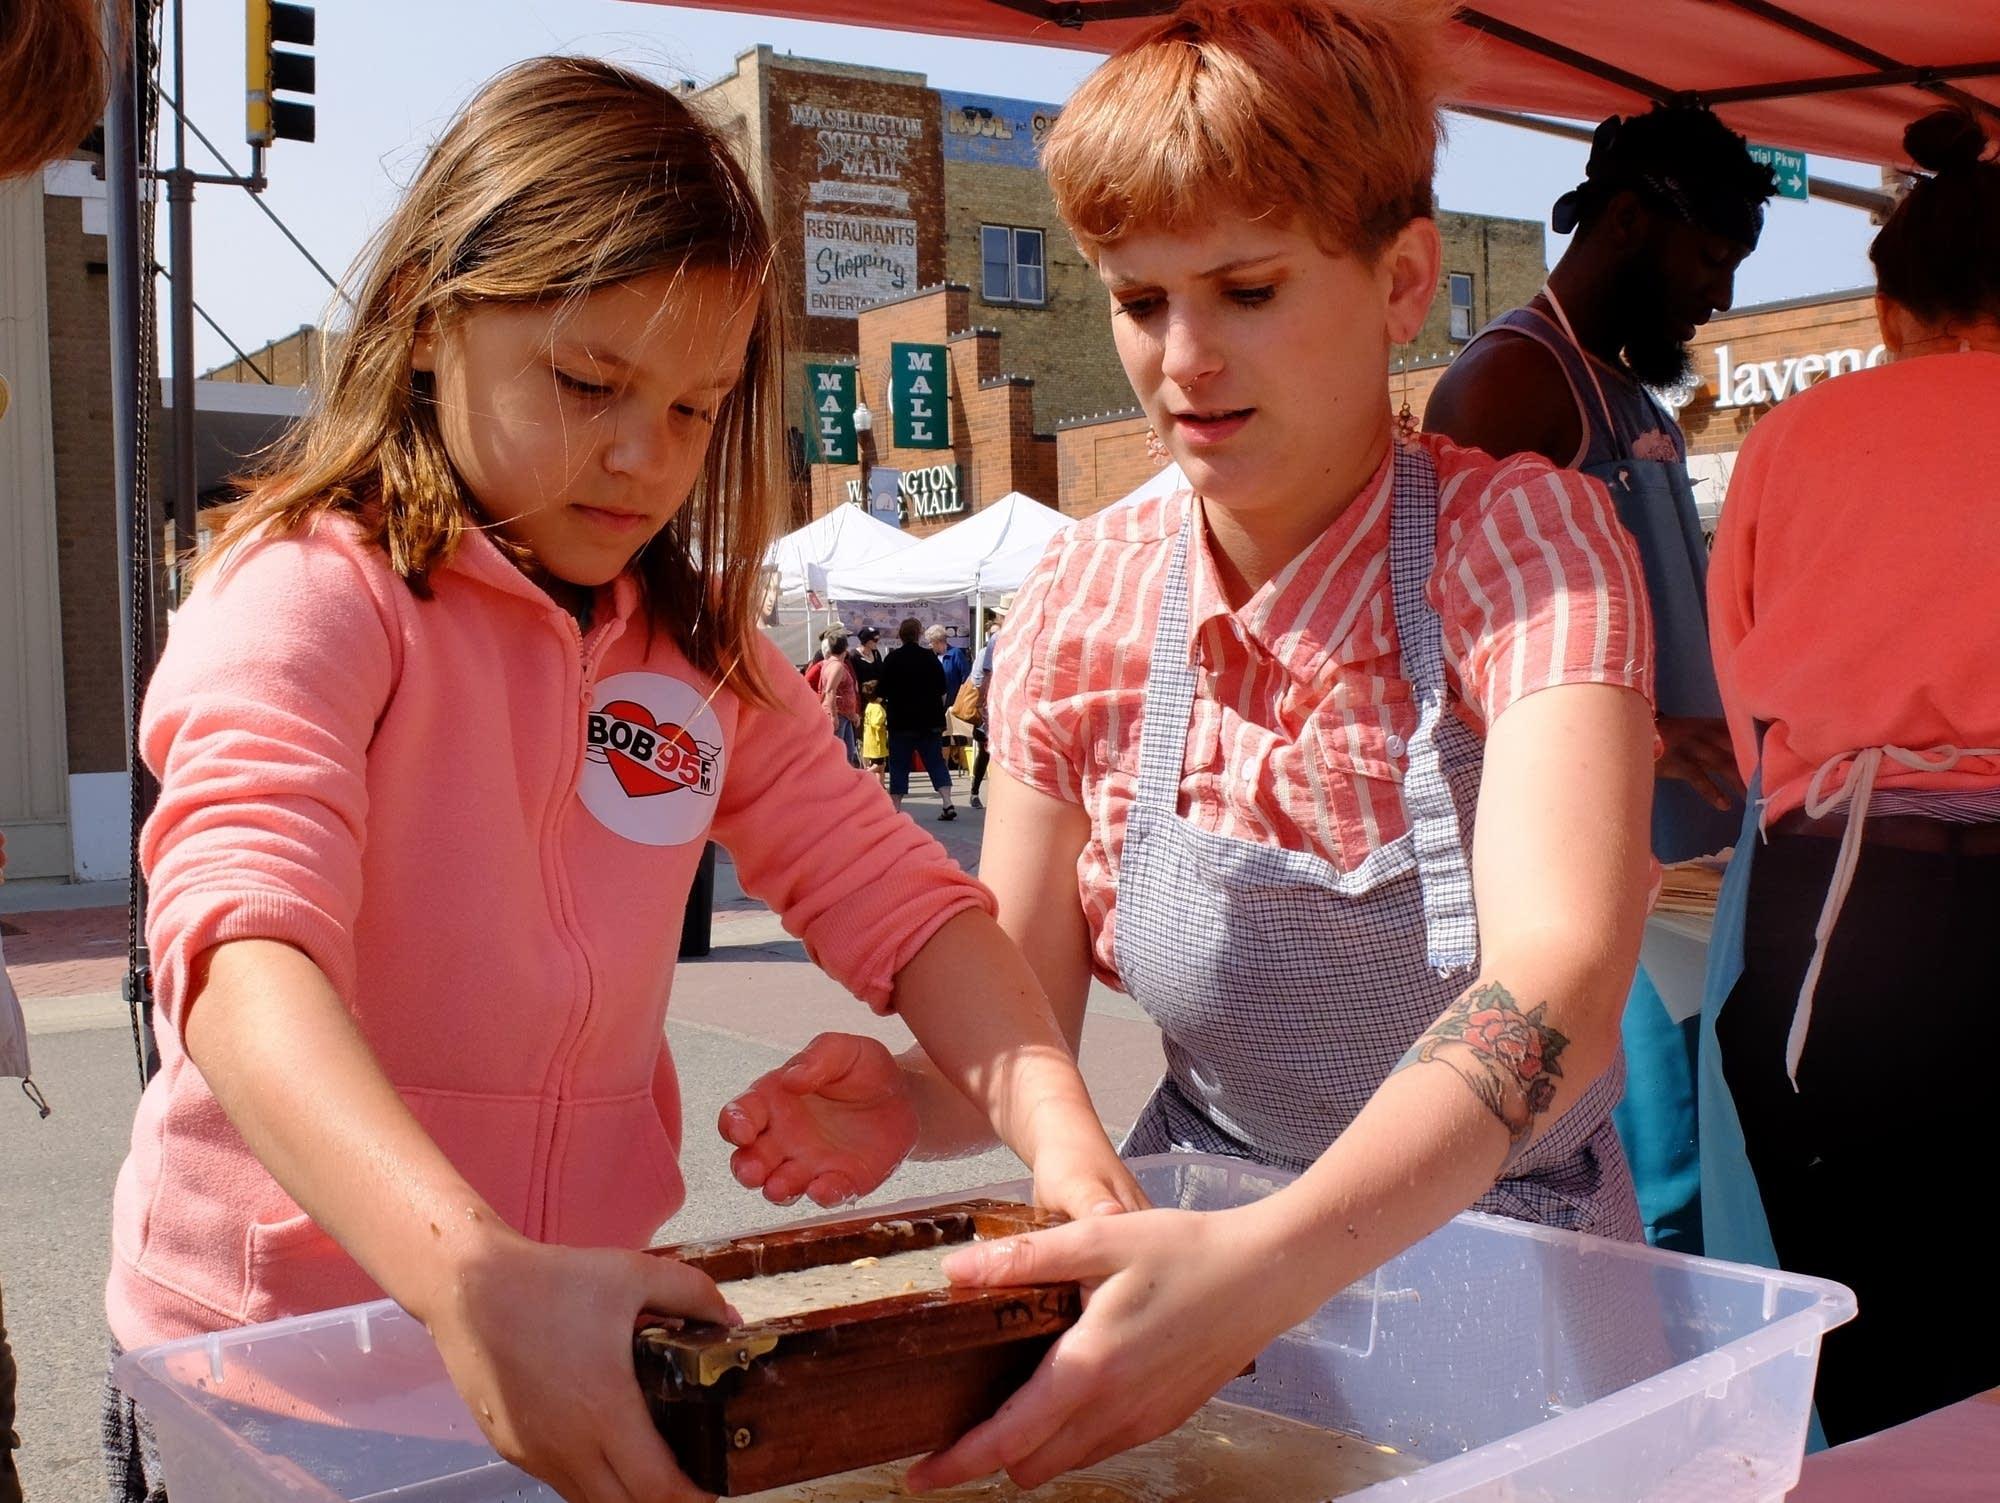 Amanda Frost (right) helps Hattie Devries (left) make a sheet of paper.